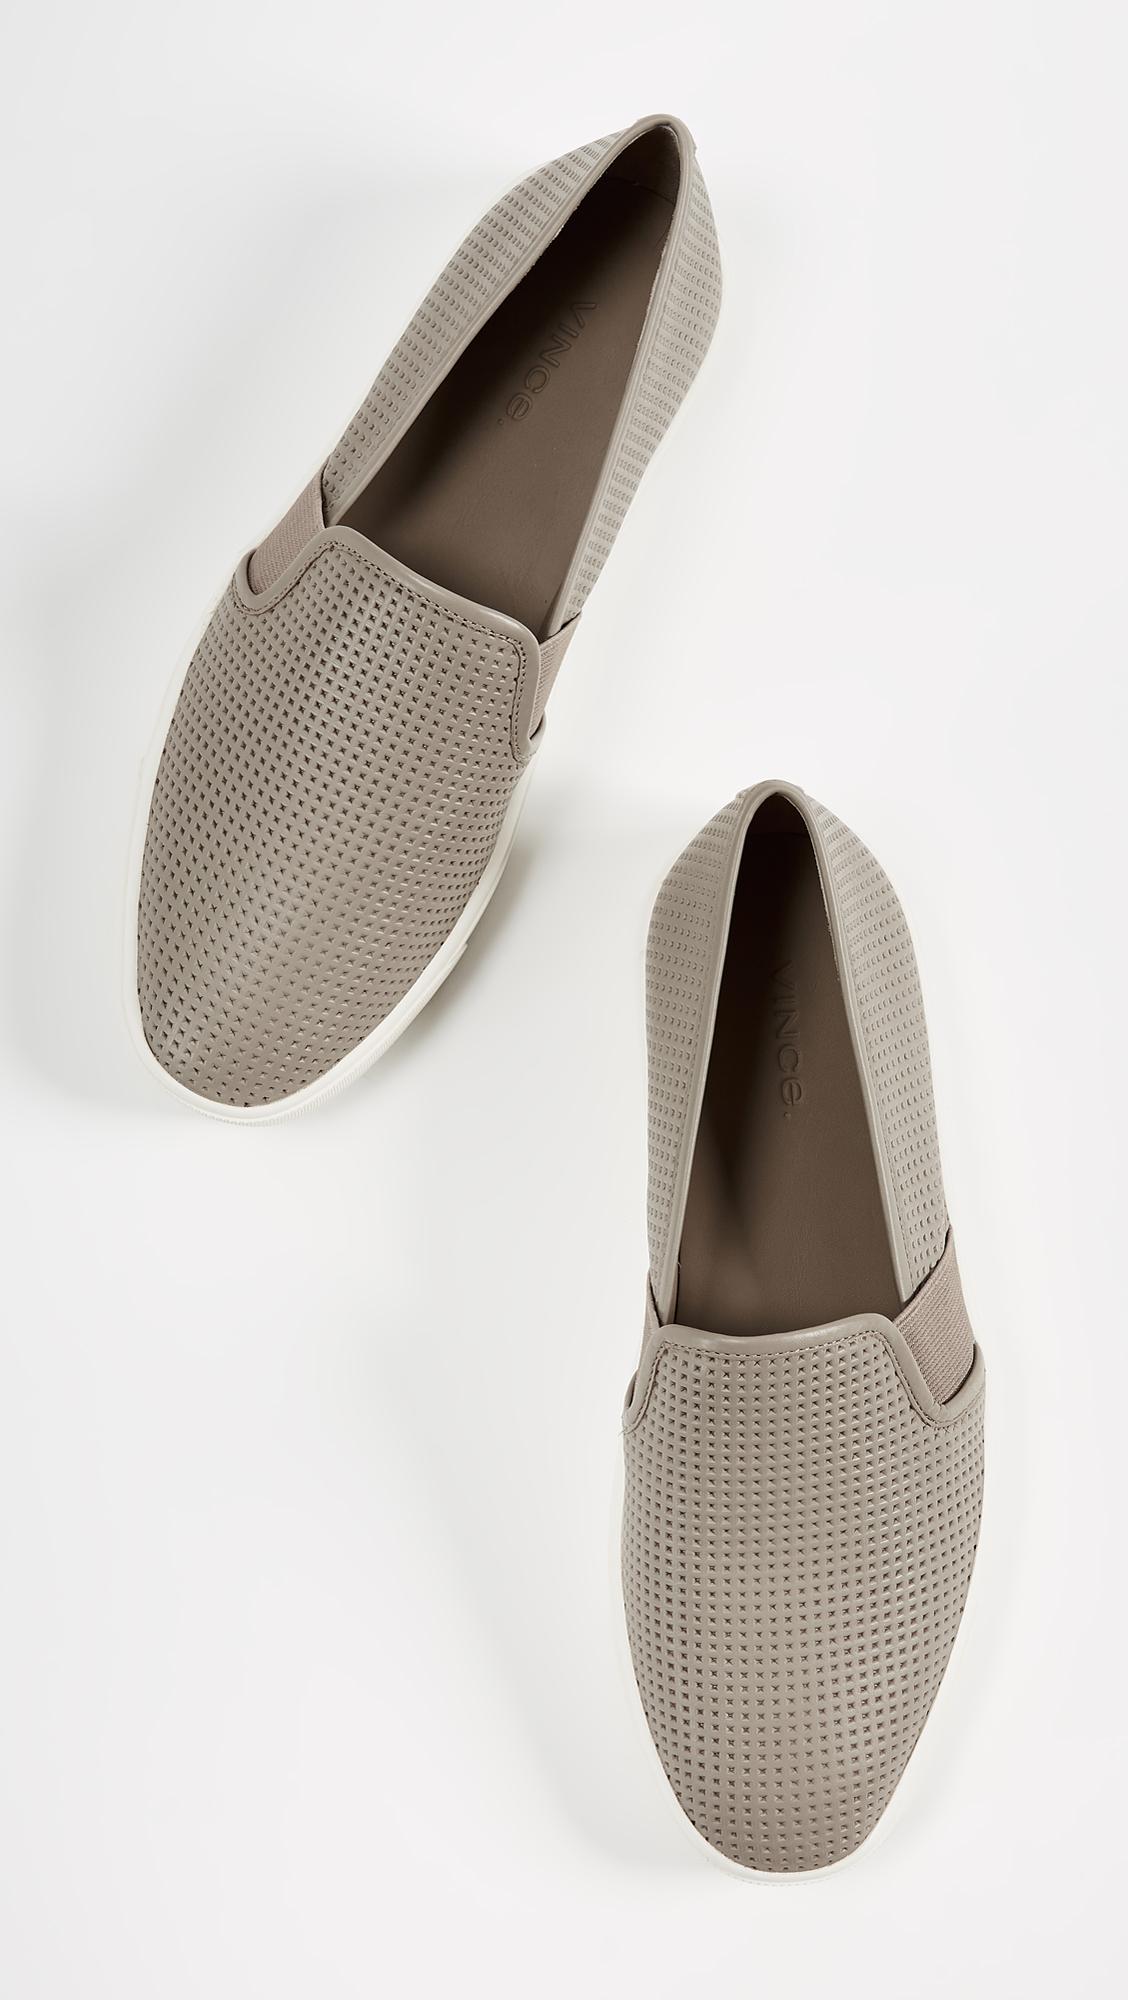 Vince Blair Slip On Sneakers Shopbop D Island Shoes British Comfort Leather Dark Brown